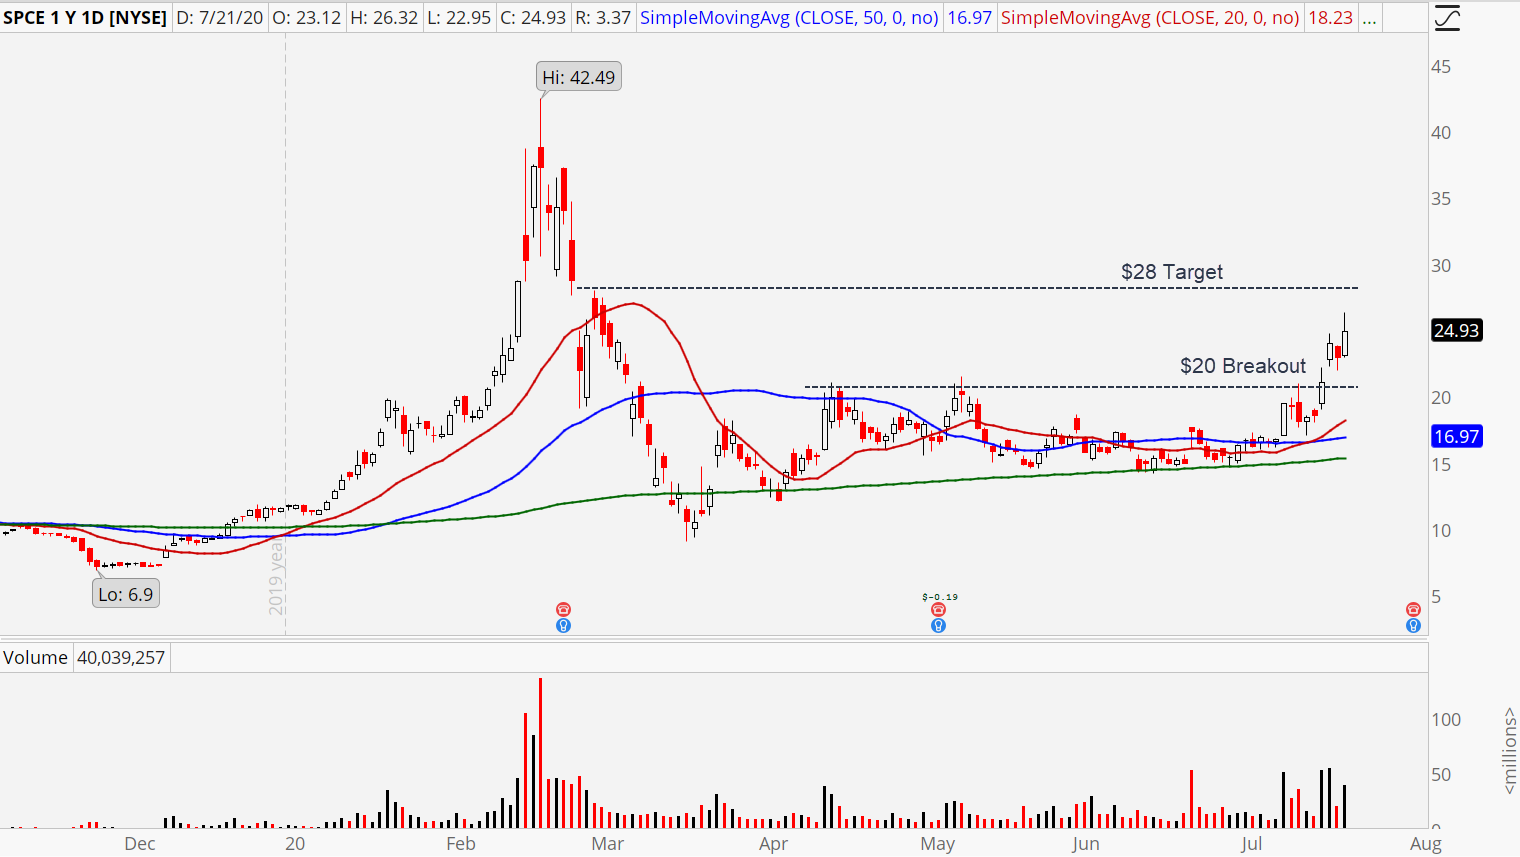 Virgin Galactic (SPCE) stock chart showing breakout target